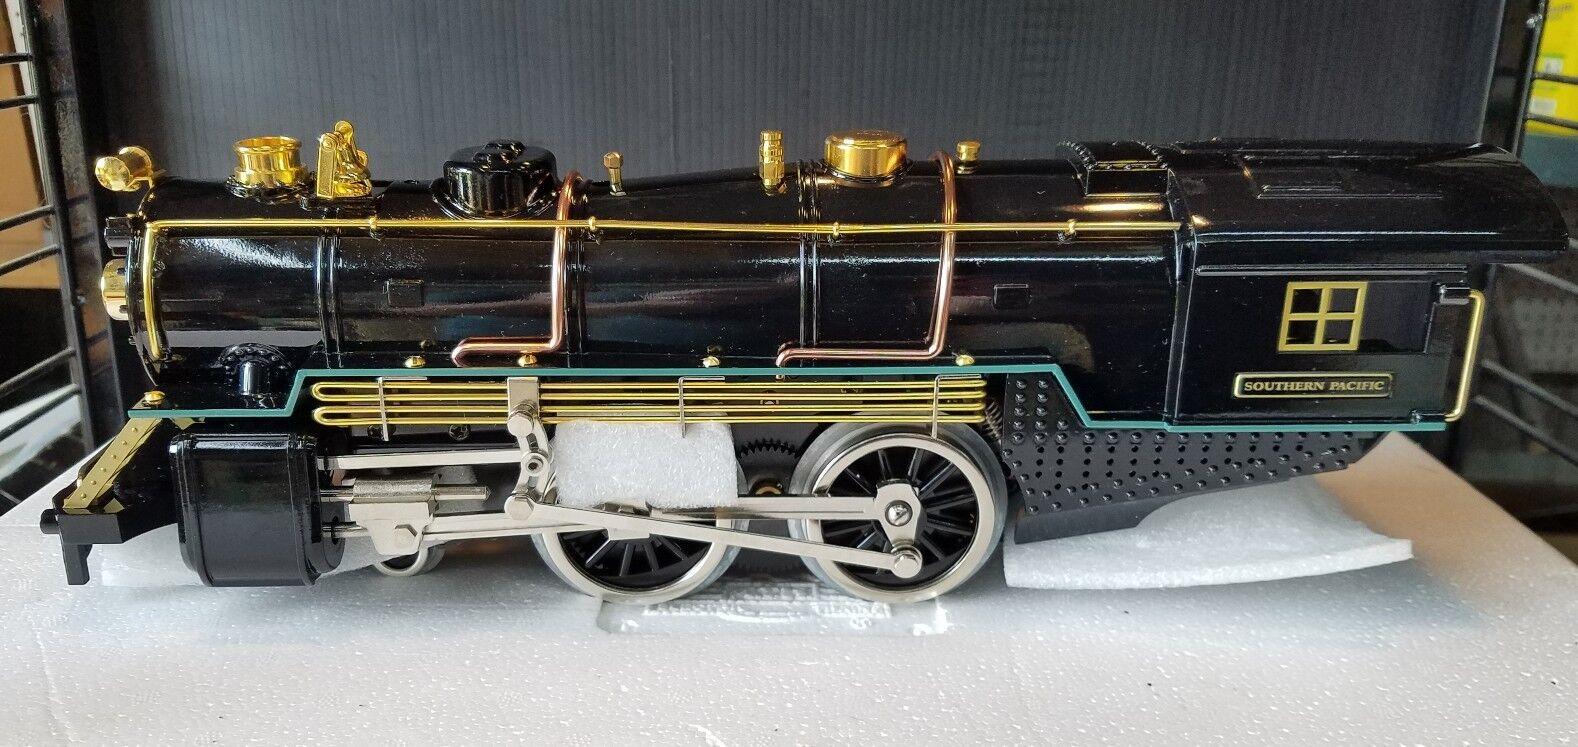 MTH Hojalata 10-1289-0 nero tradicional locomotora de vapor